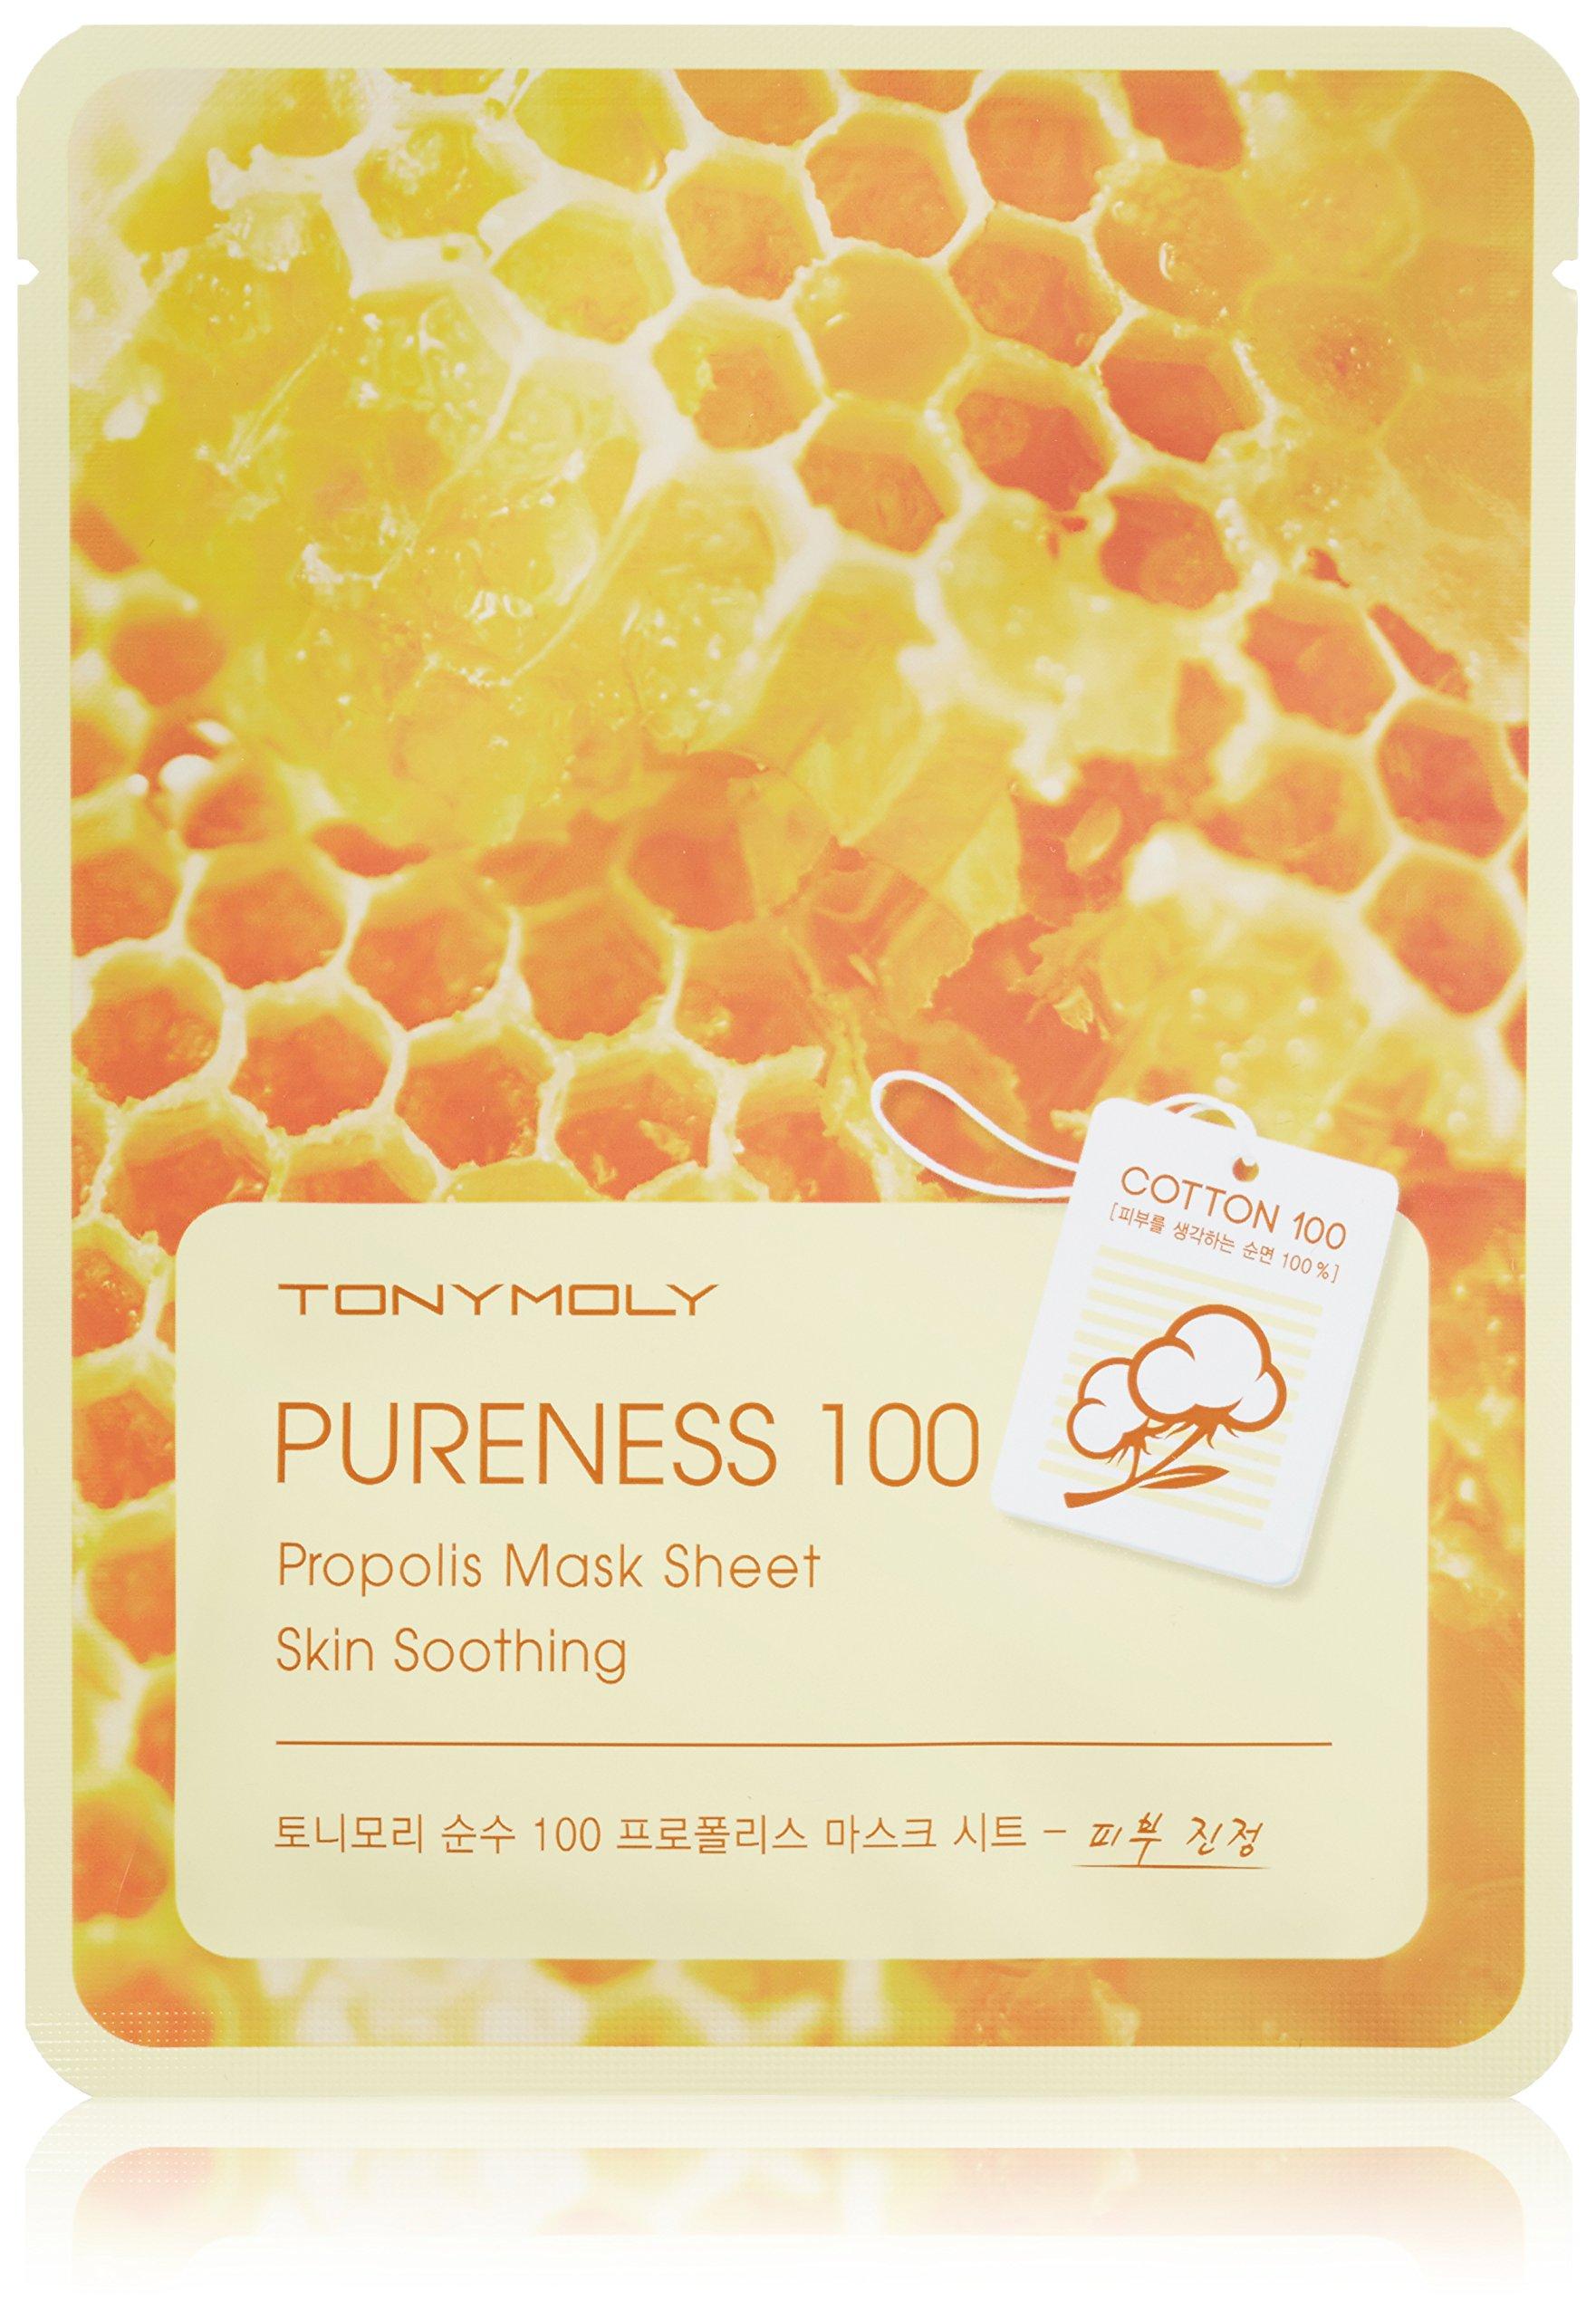 Tonymoly - Pureness 100 Propolis Skin Calming Mask Sheet